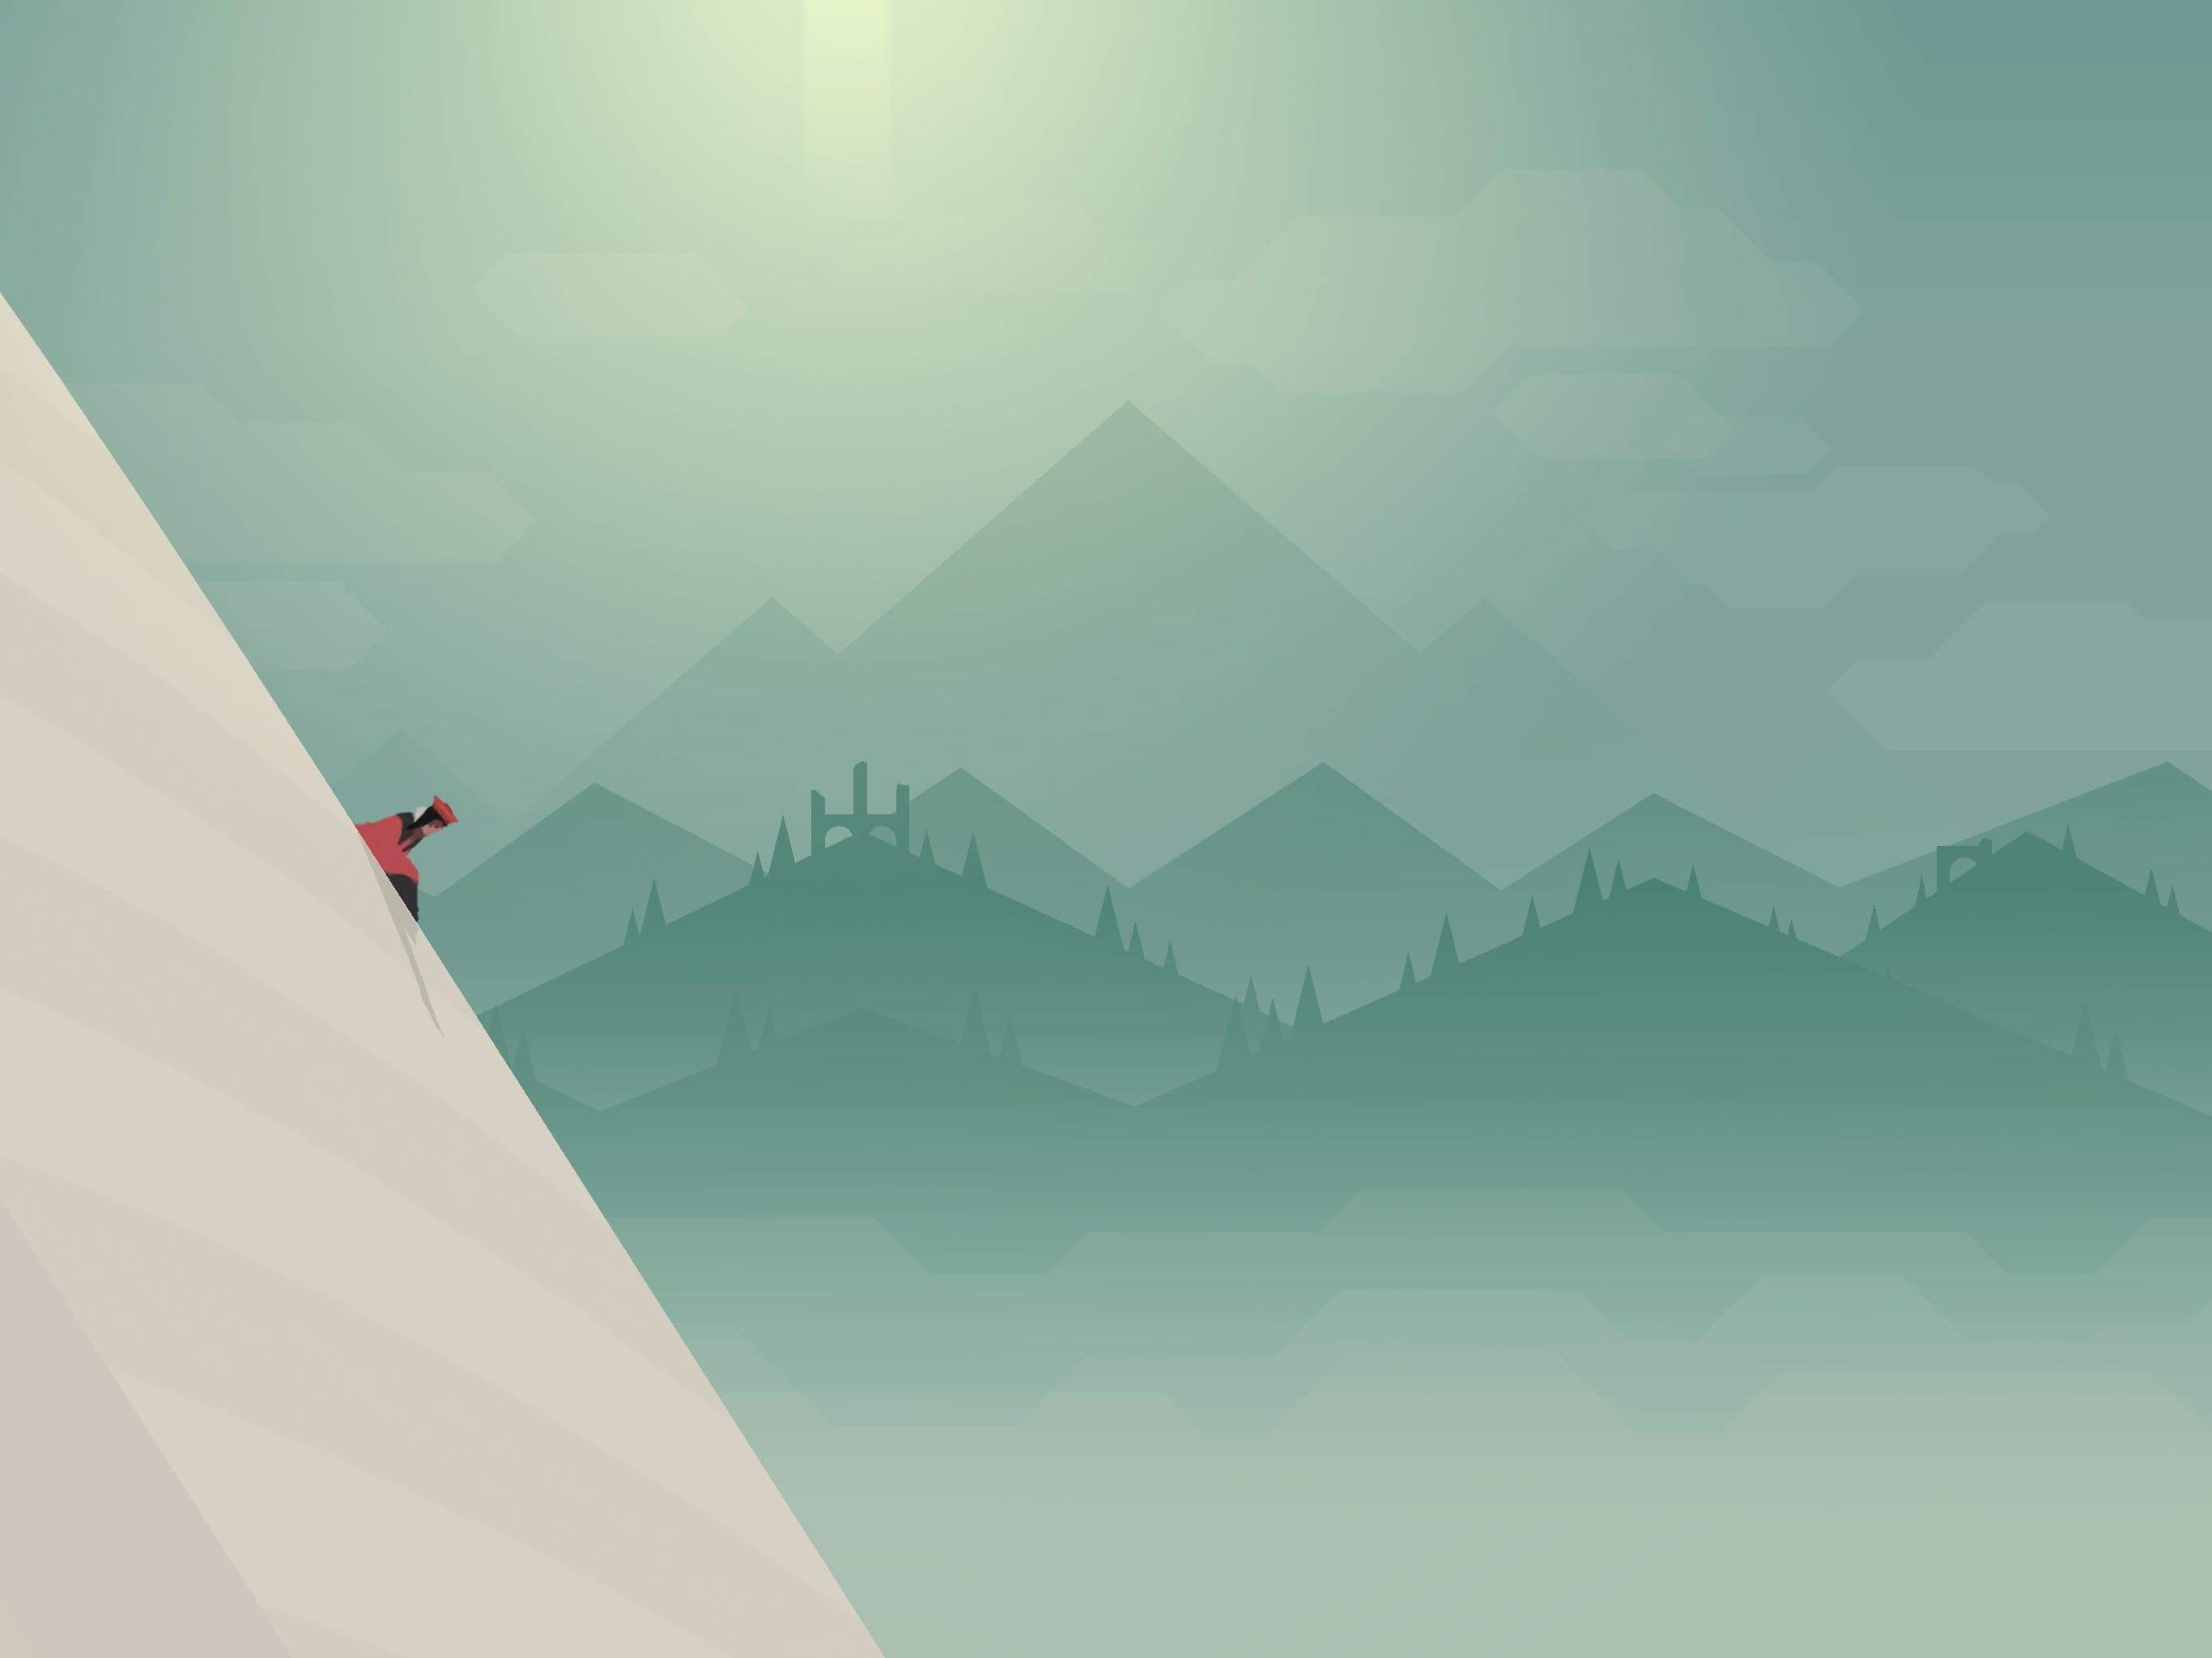 Altos-Adventure-Zen-Mode-02-hero